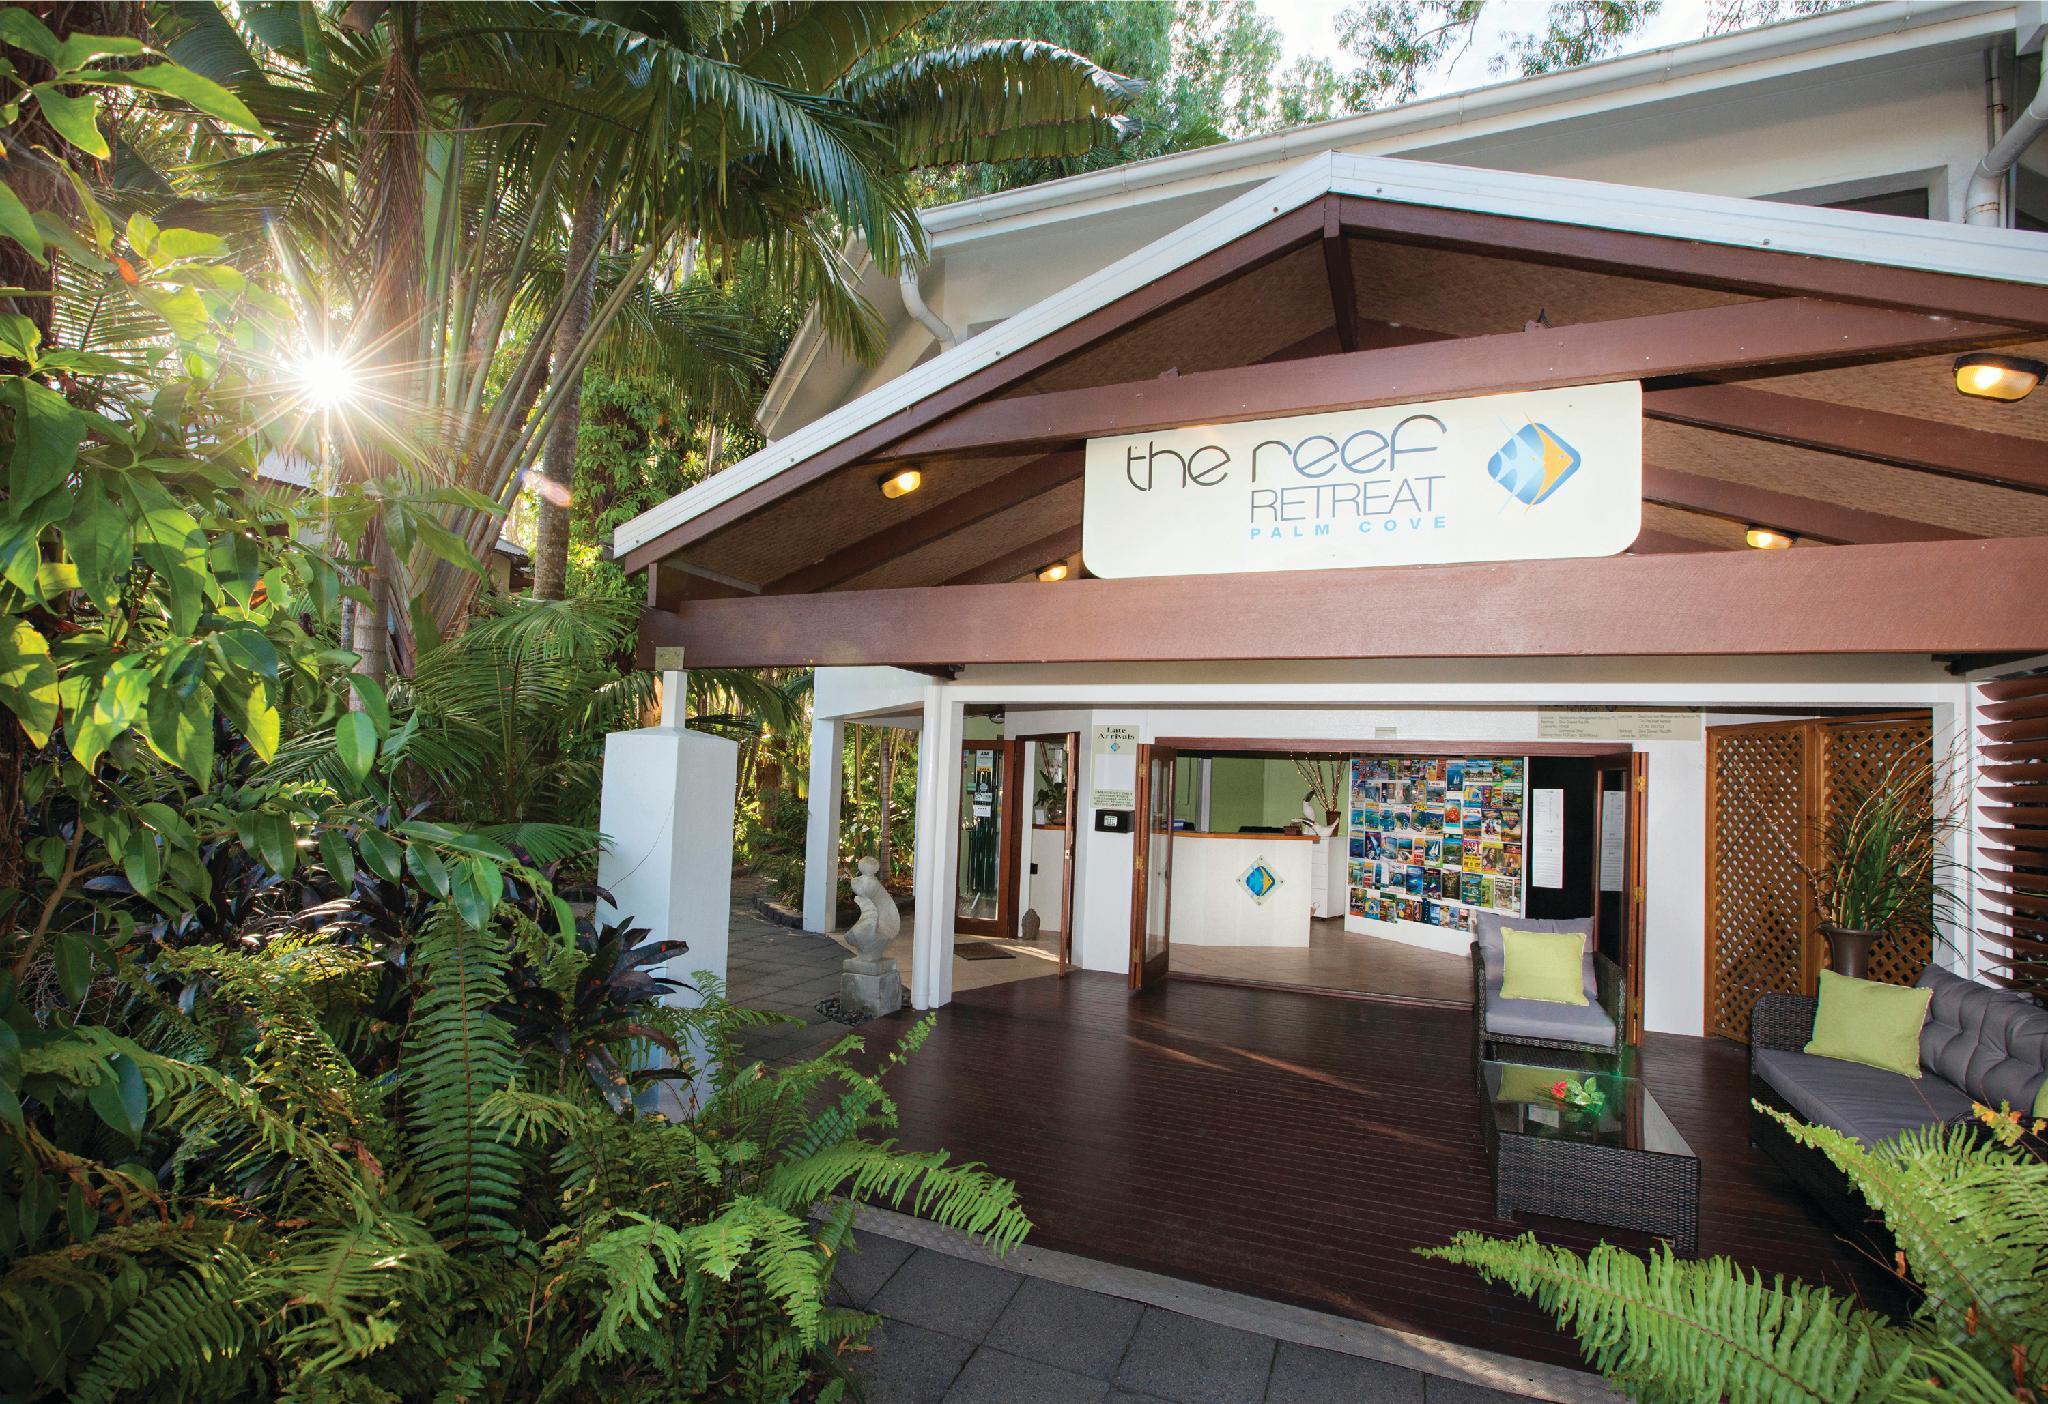 The Reef Retreat Hotel